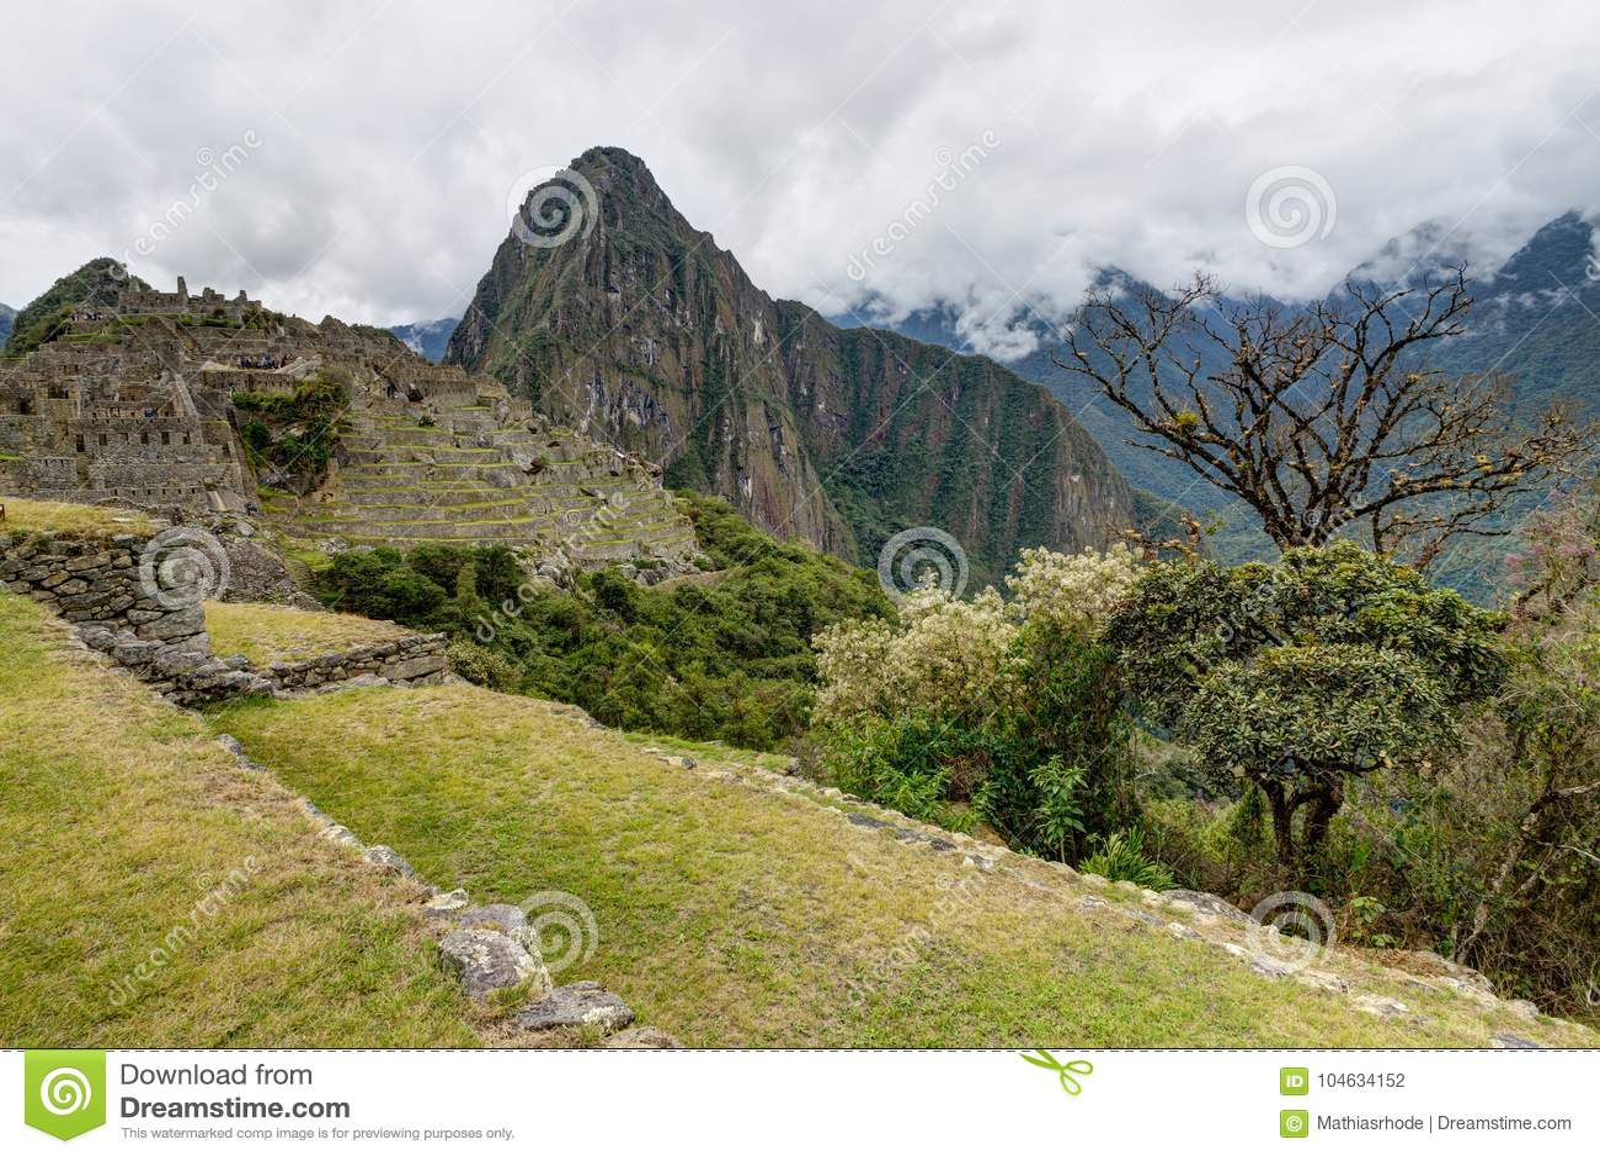 Download Machu Picchu In Peru Custo South America Stock Foto - Afbeelding bestaande uit heuvel, blauw: 104634152